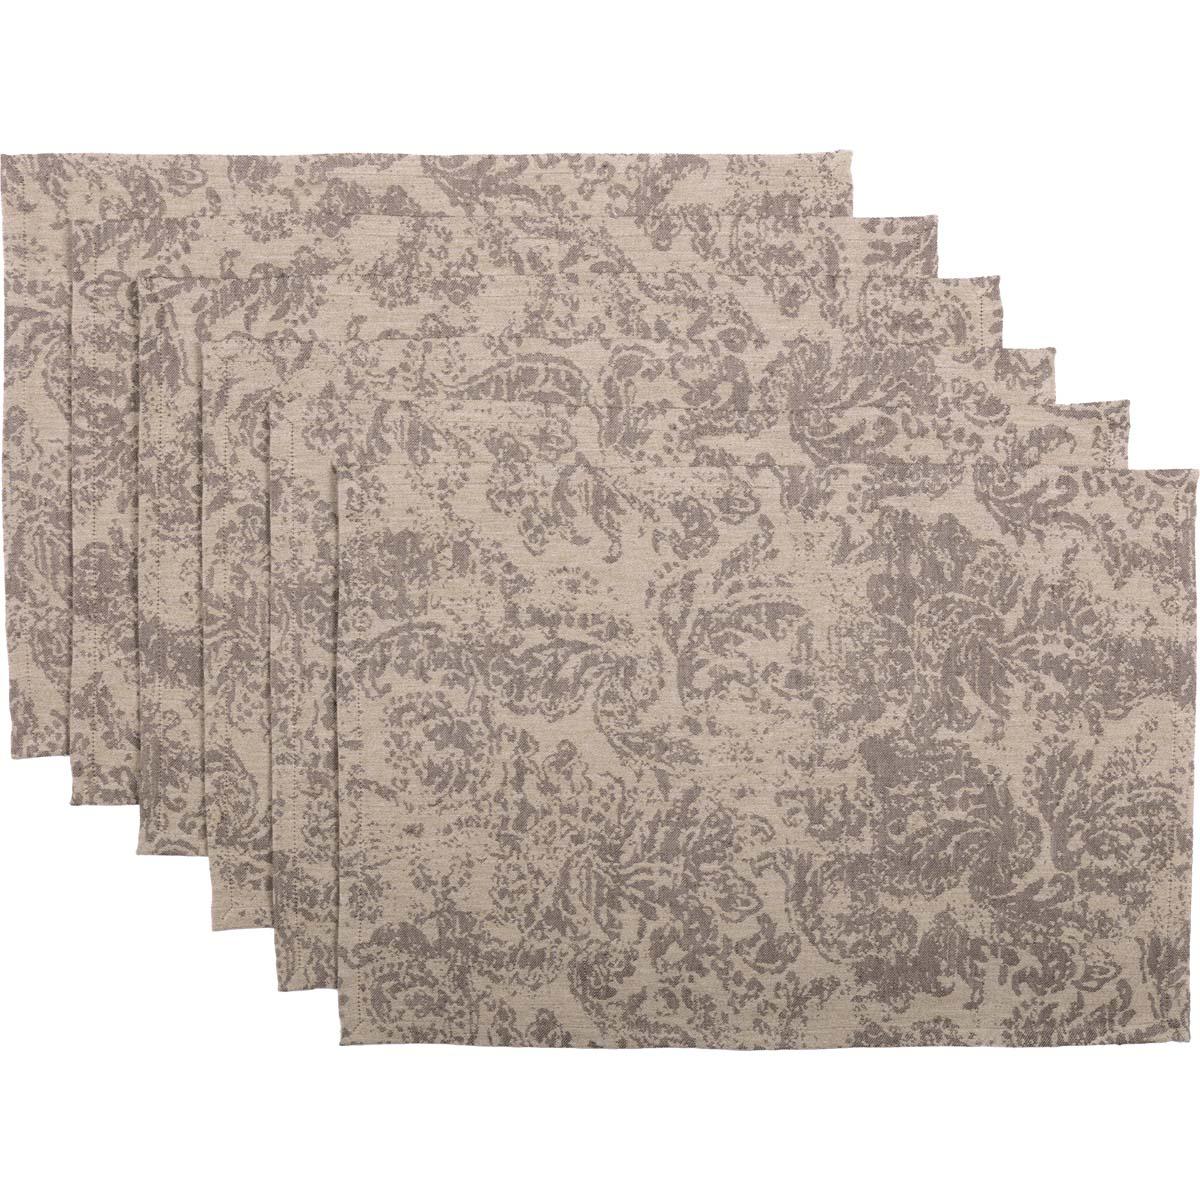 Rebecca Tan Placemat Set of 6 12x18